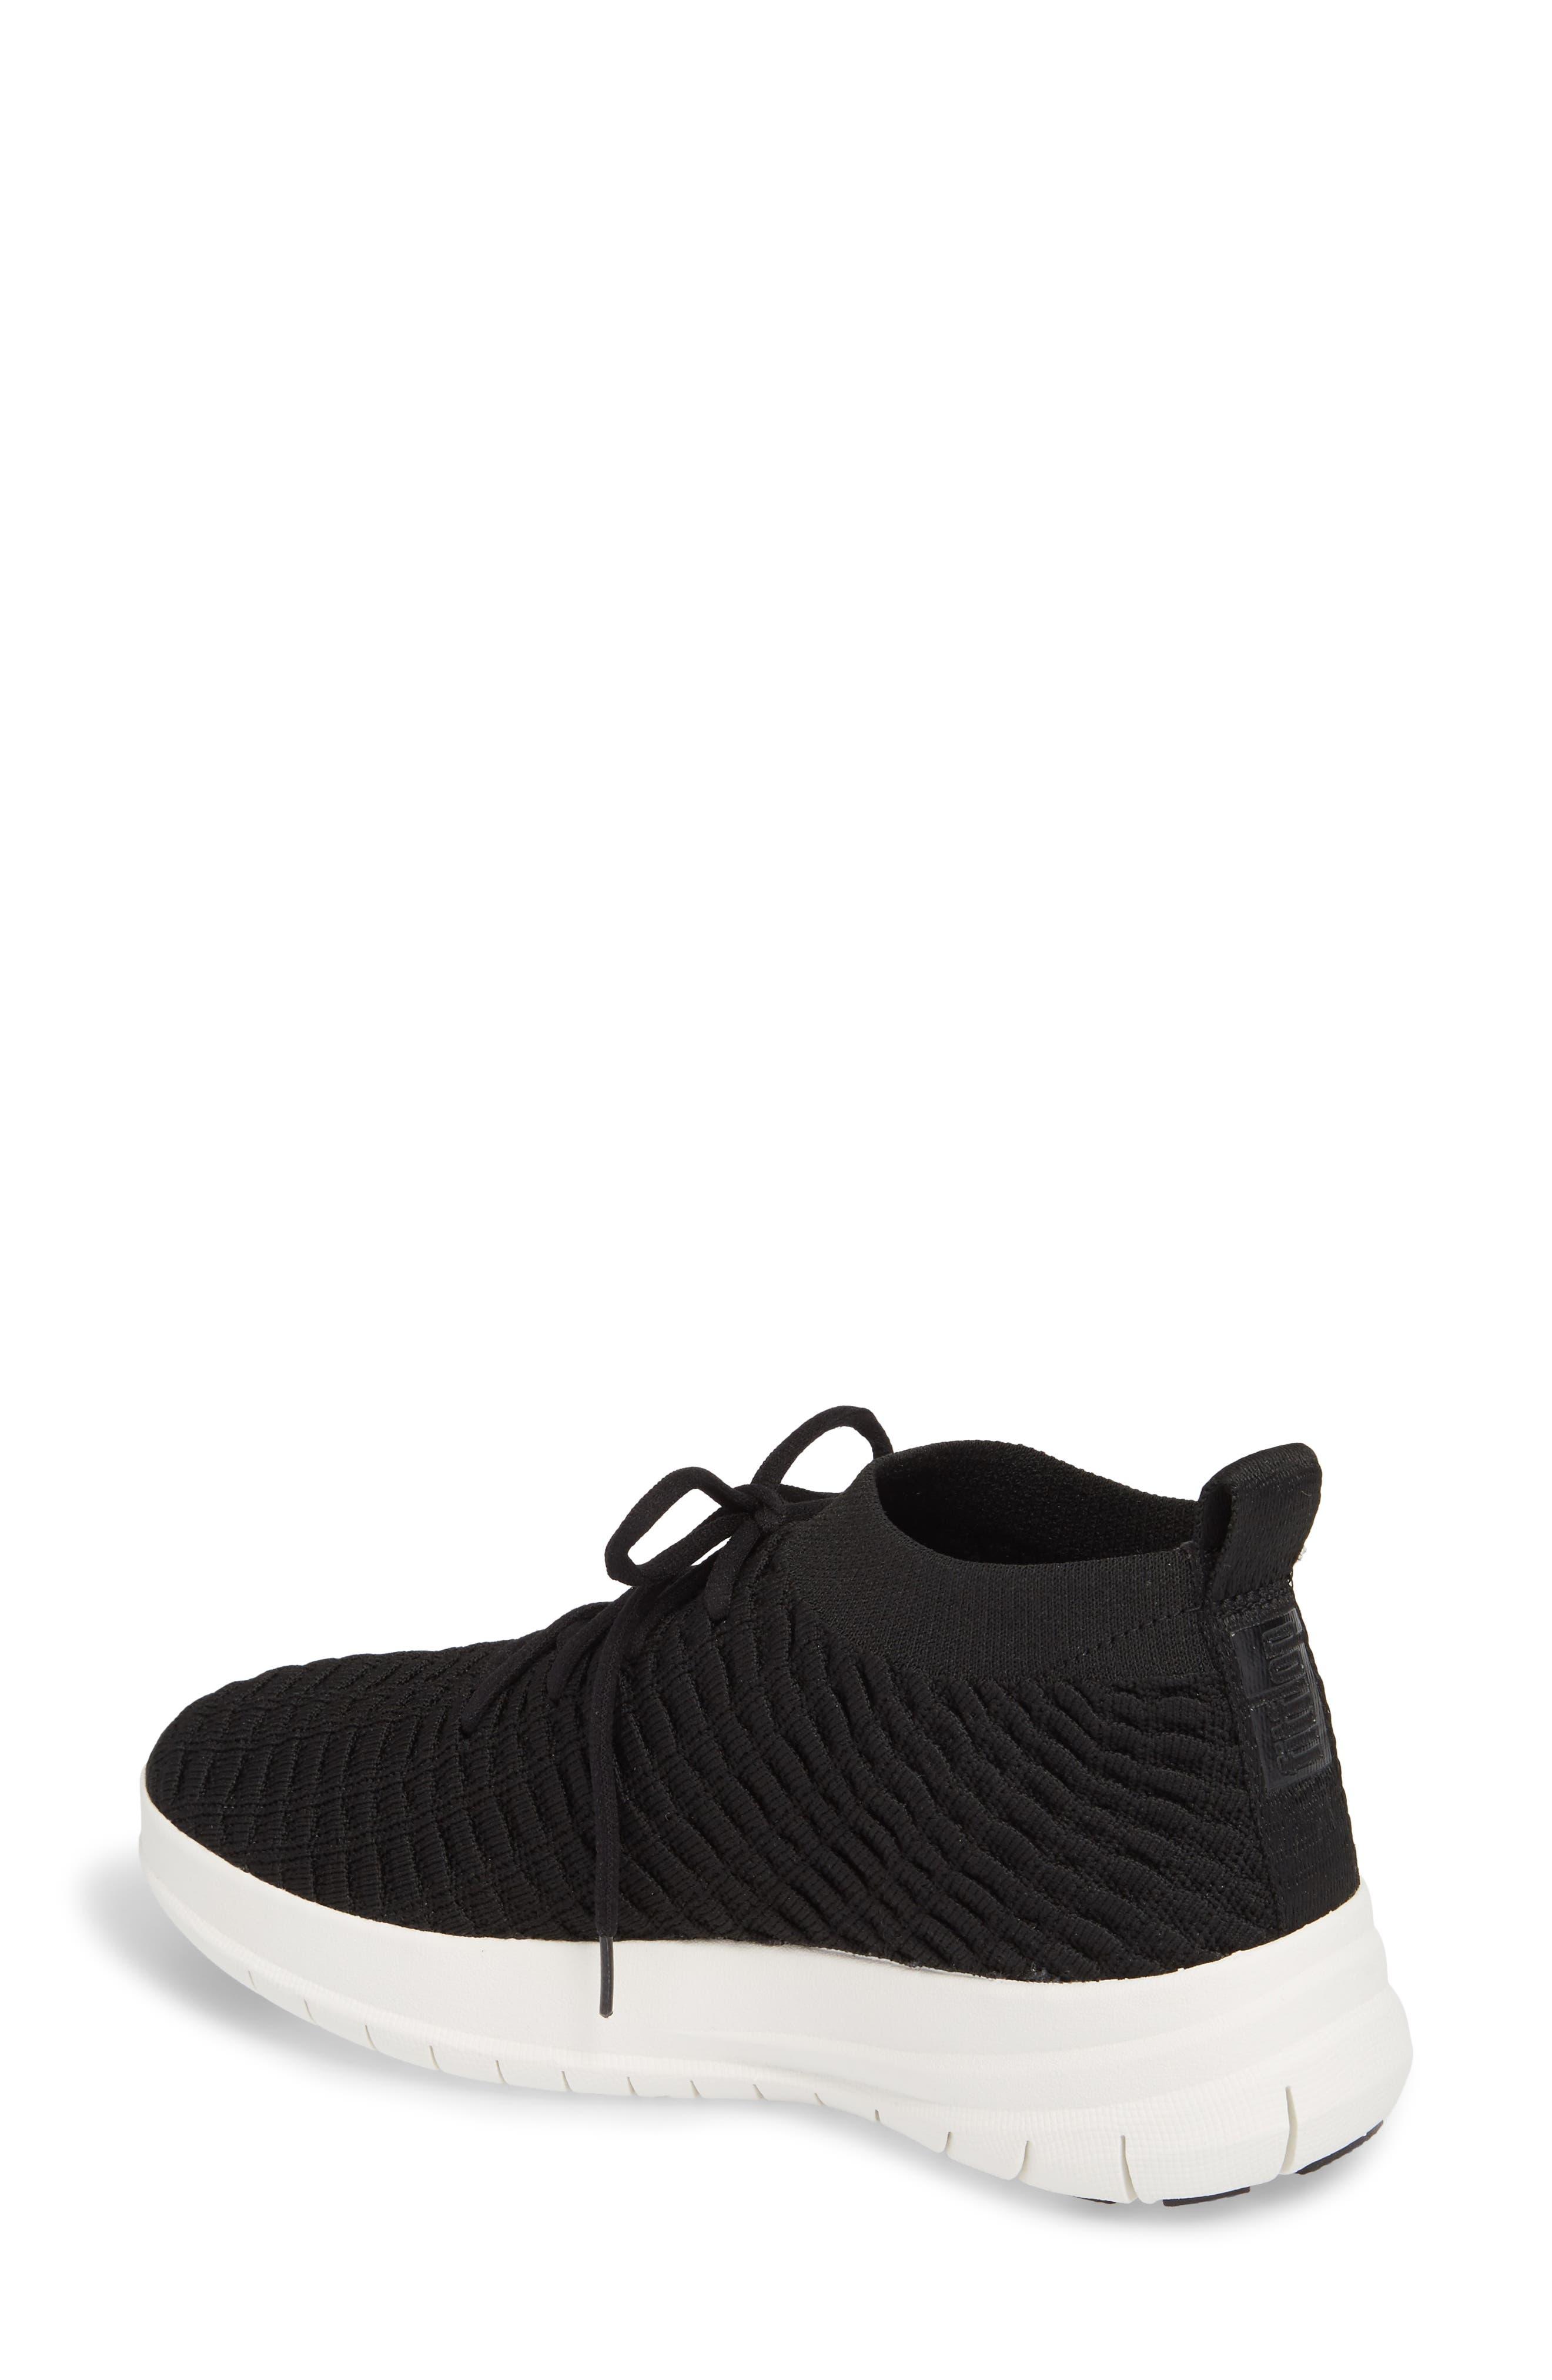 Uberknit<sup>™</sup> Slip-On High Top Sneaker,                             Alternate thumbnail 2, color,                             001